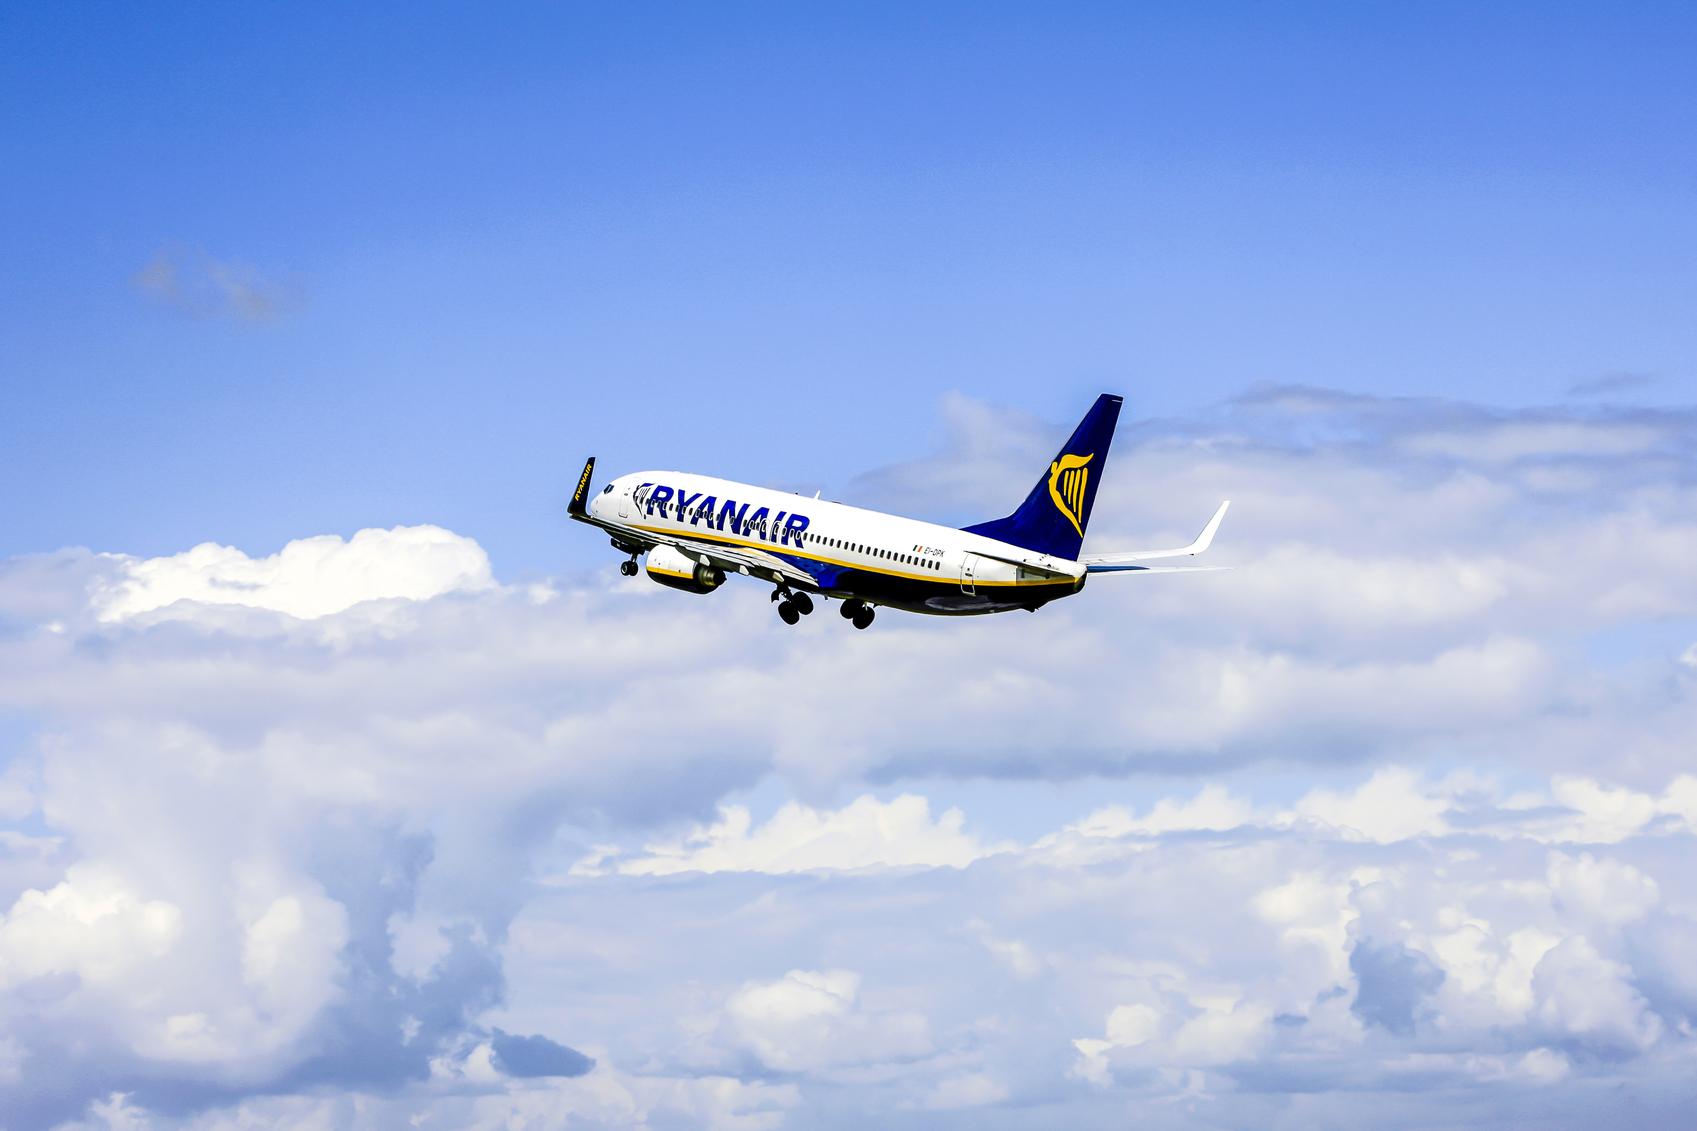 Bristol, Somerset, UK - June 15, 2009: RyanAir Irish Budget Airlines Boeing 737-400 aircraft departs Bristol airport UK